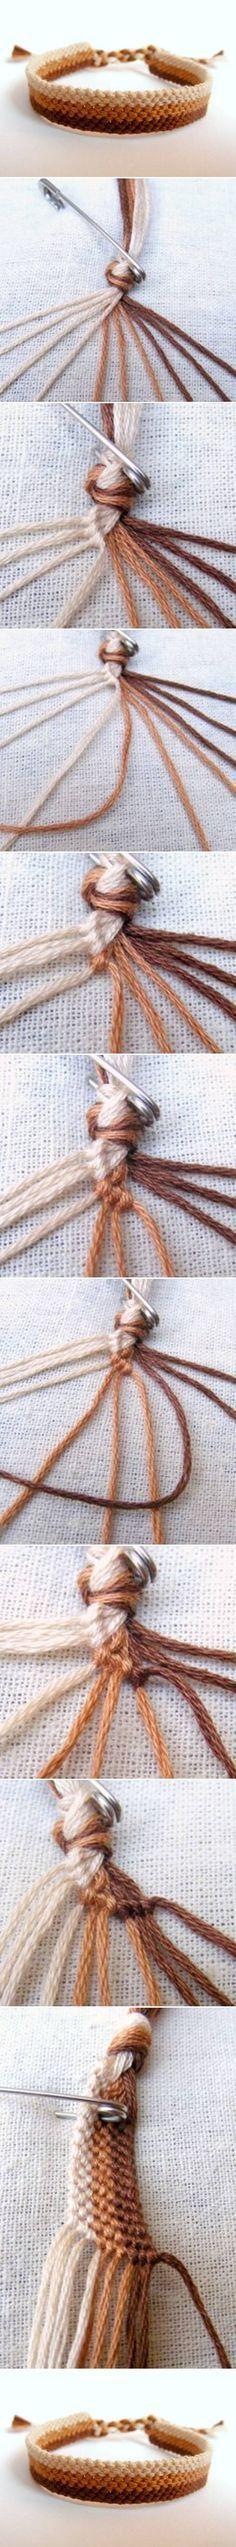 Pulseiras de linha. Imagens em: http://www.usefuldiy.com/es/diy-easy-weave-bracelet/ DIY Easy Weave Bracelet